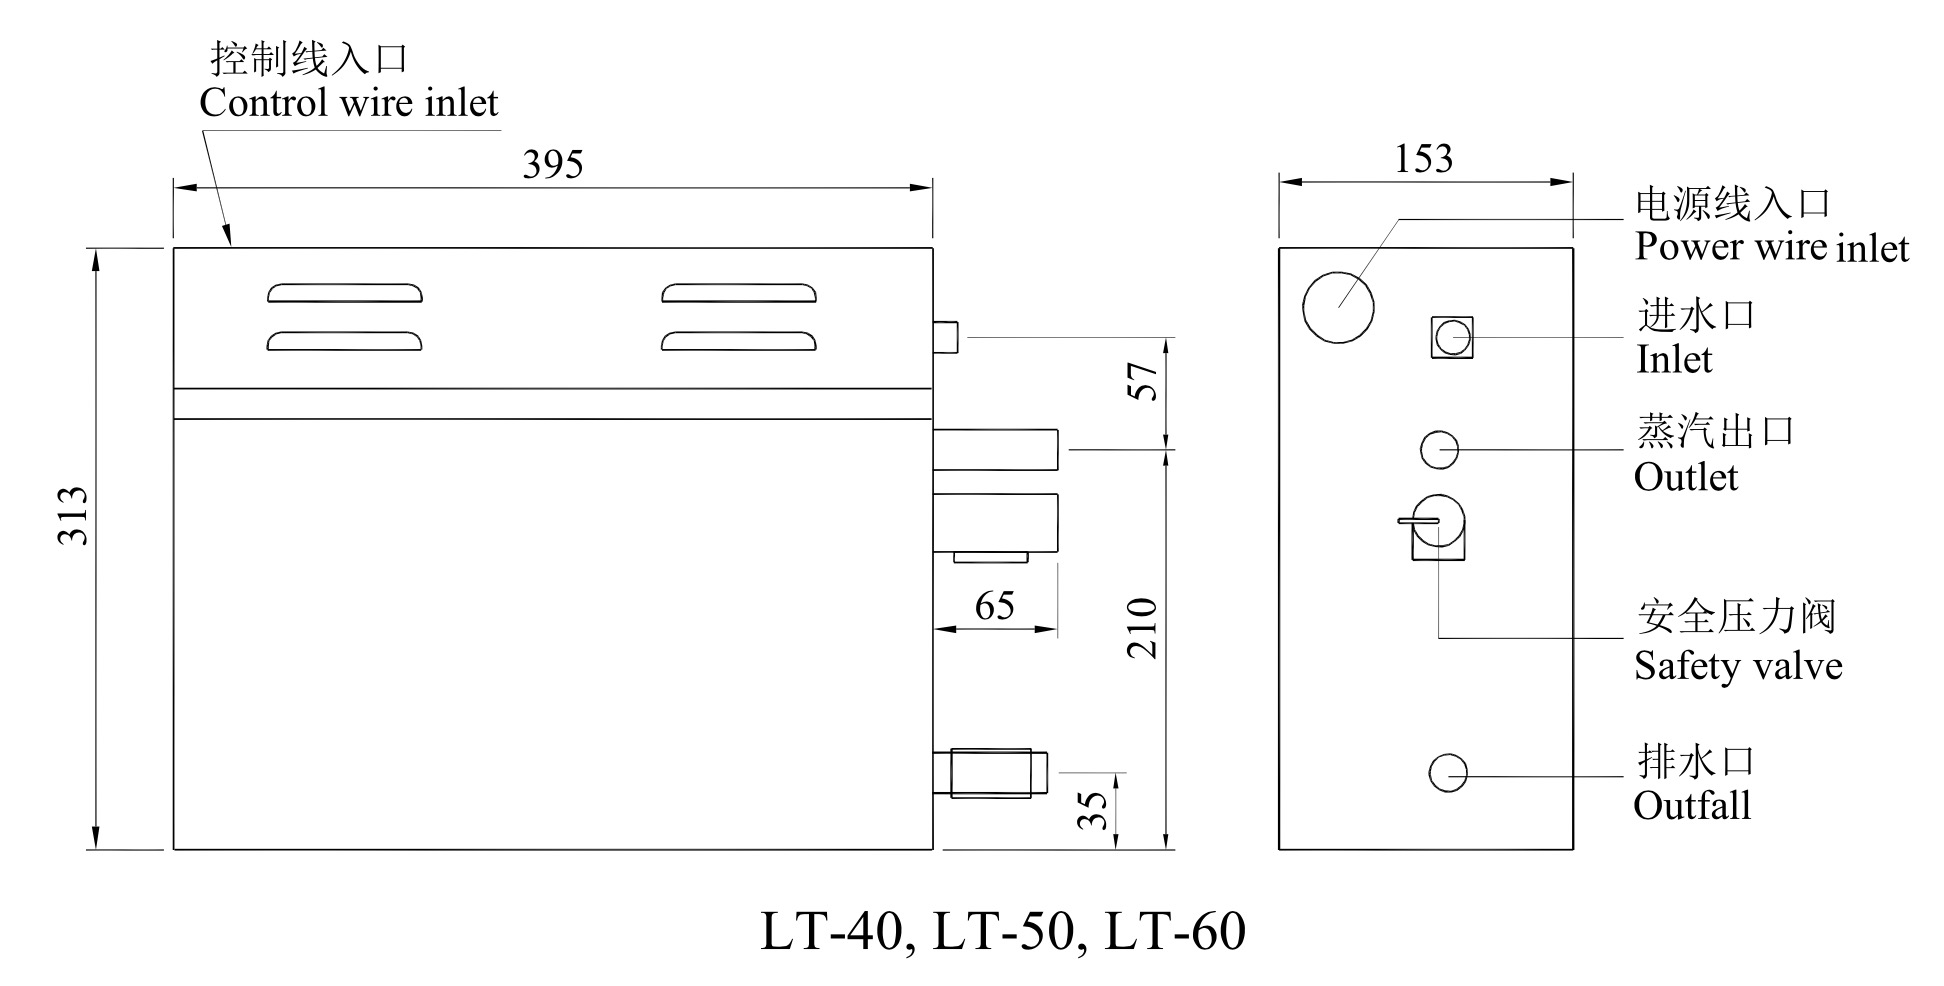 LT-40, LT-50, LT-60